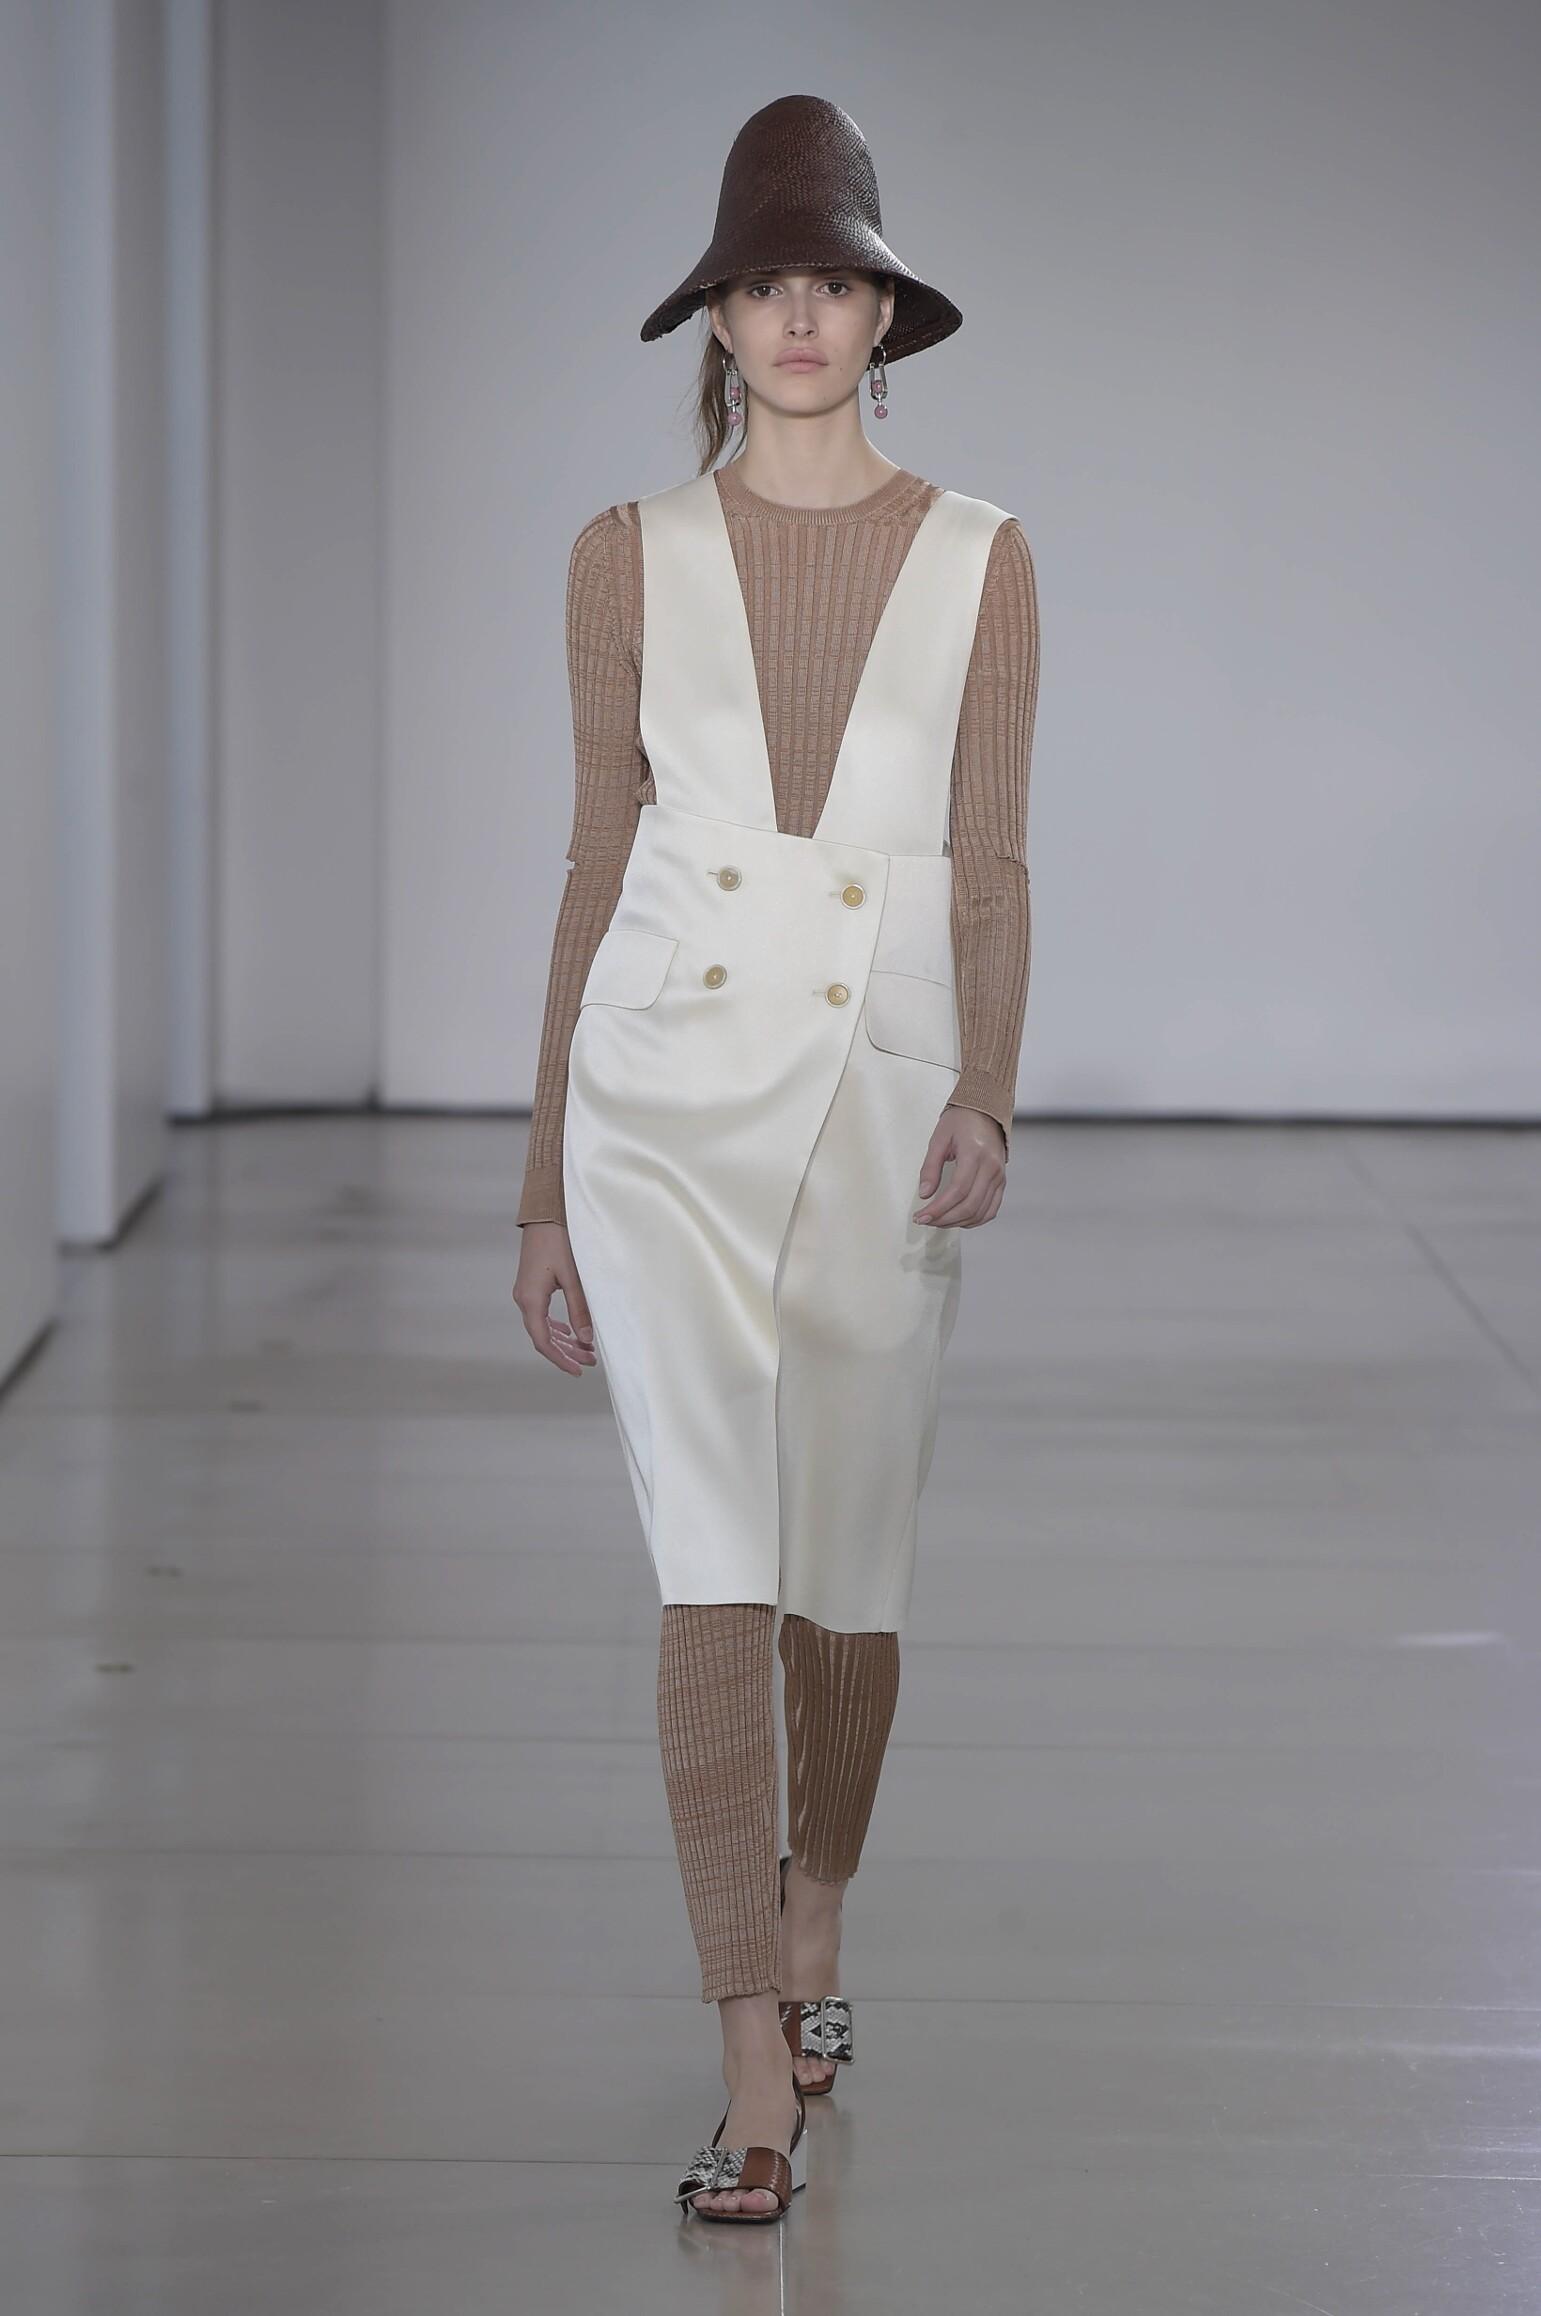 Jil Sander SS 2016 Womenswear